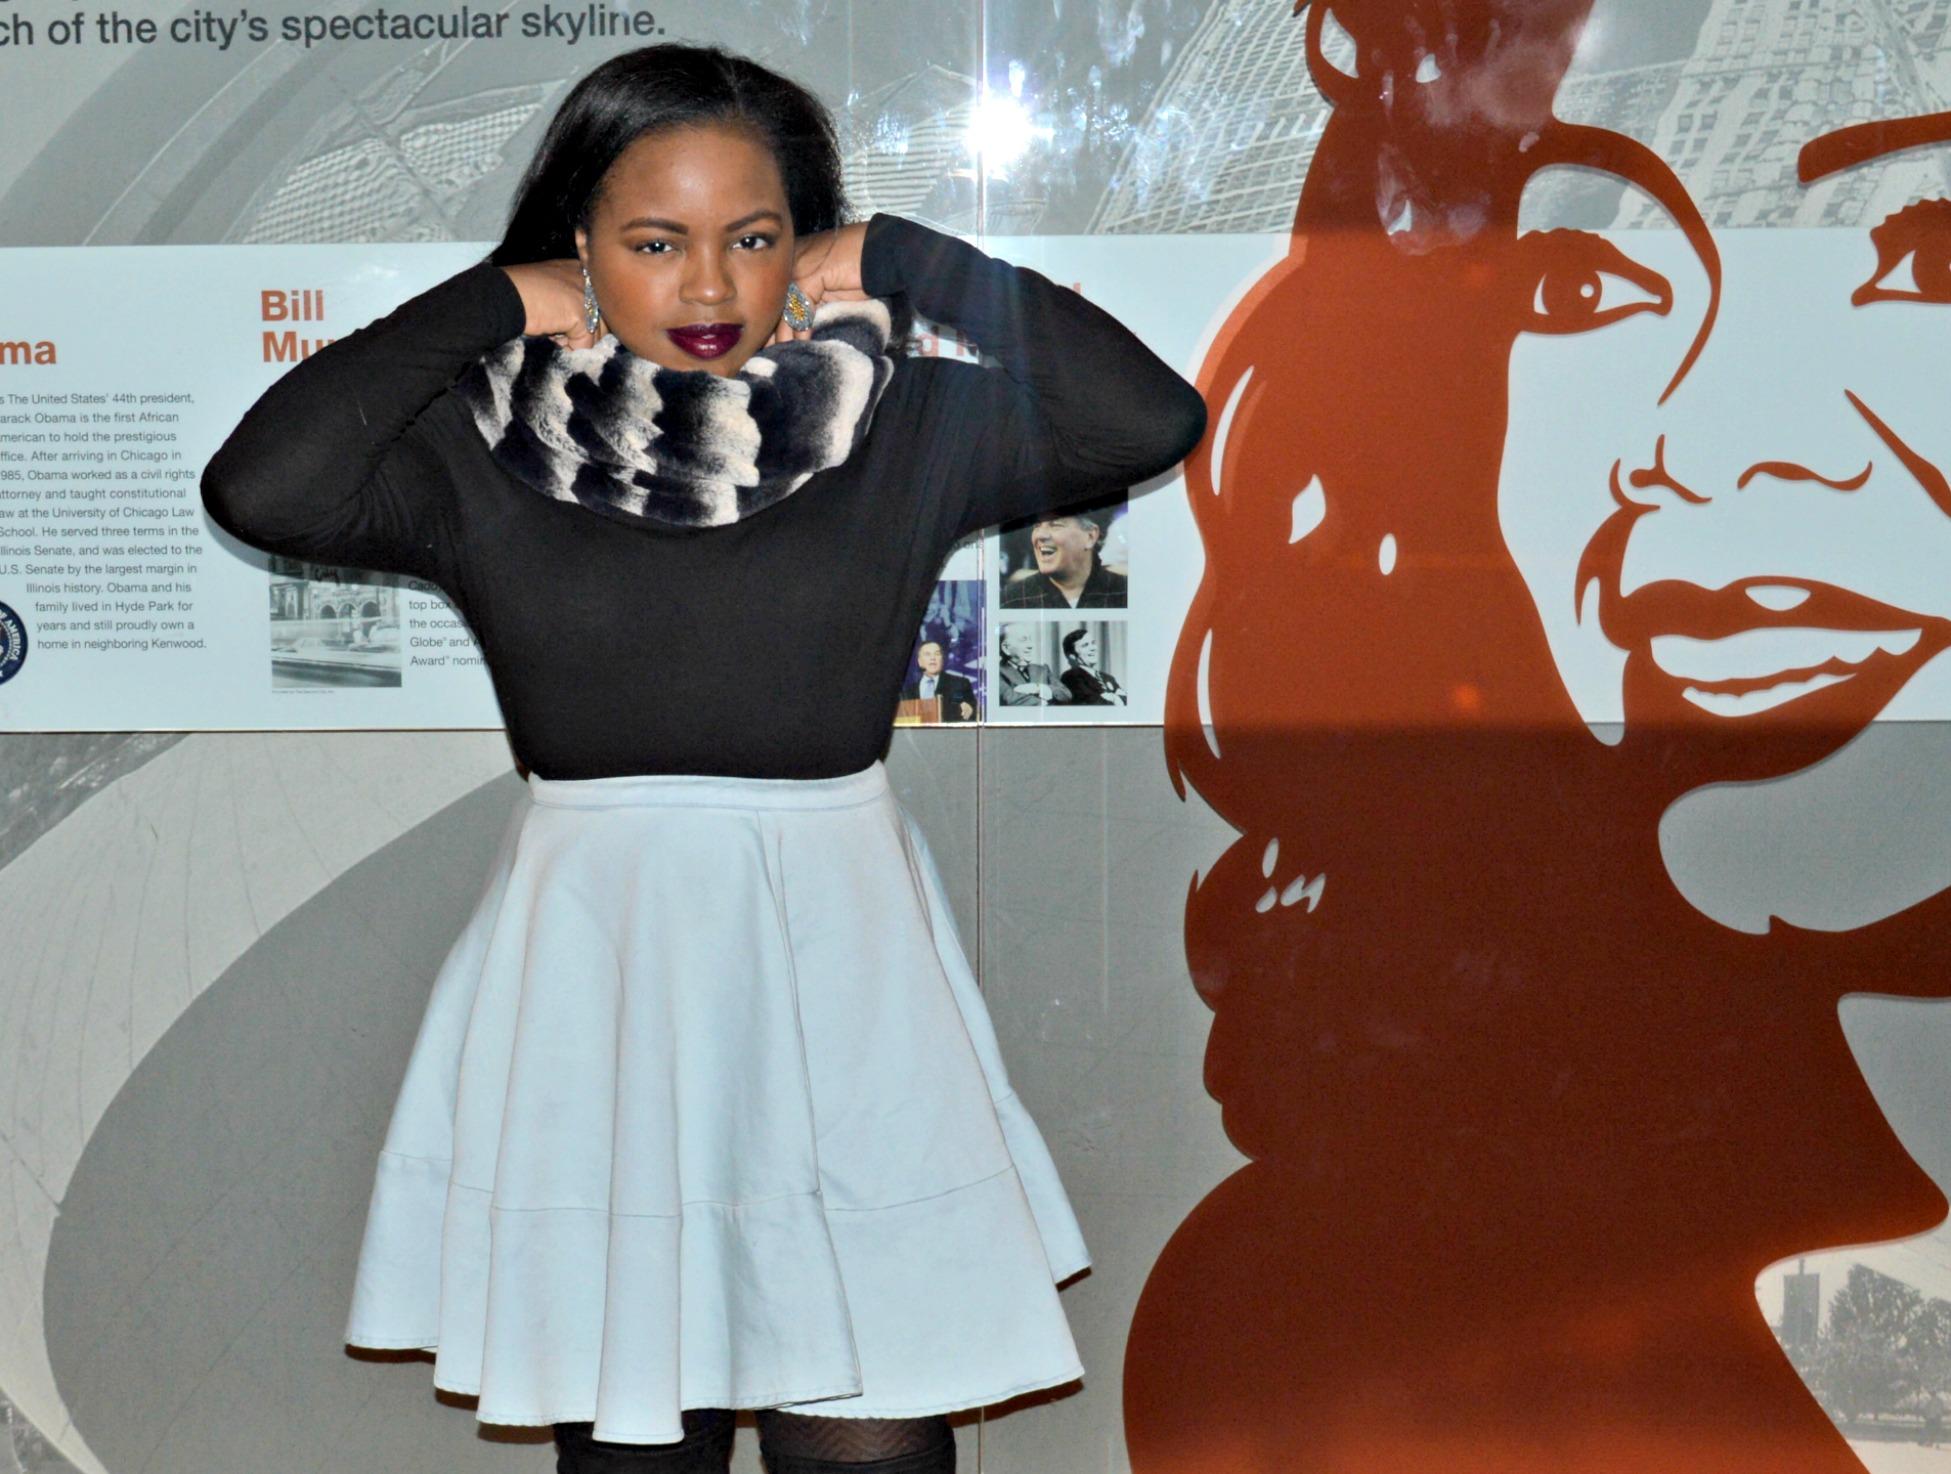 purple lipstick- skydeck chicago- skater skirt- blue jean skirt- snood- black woman with purple lipstick-purple lipstick